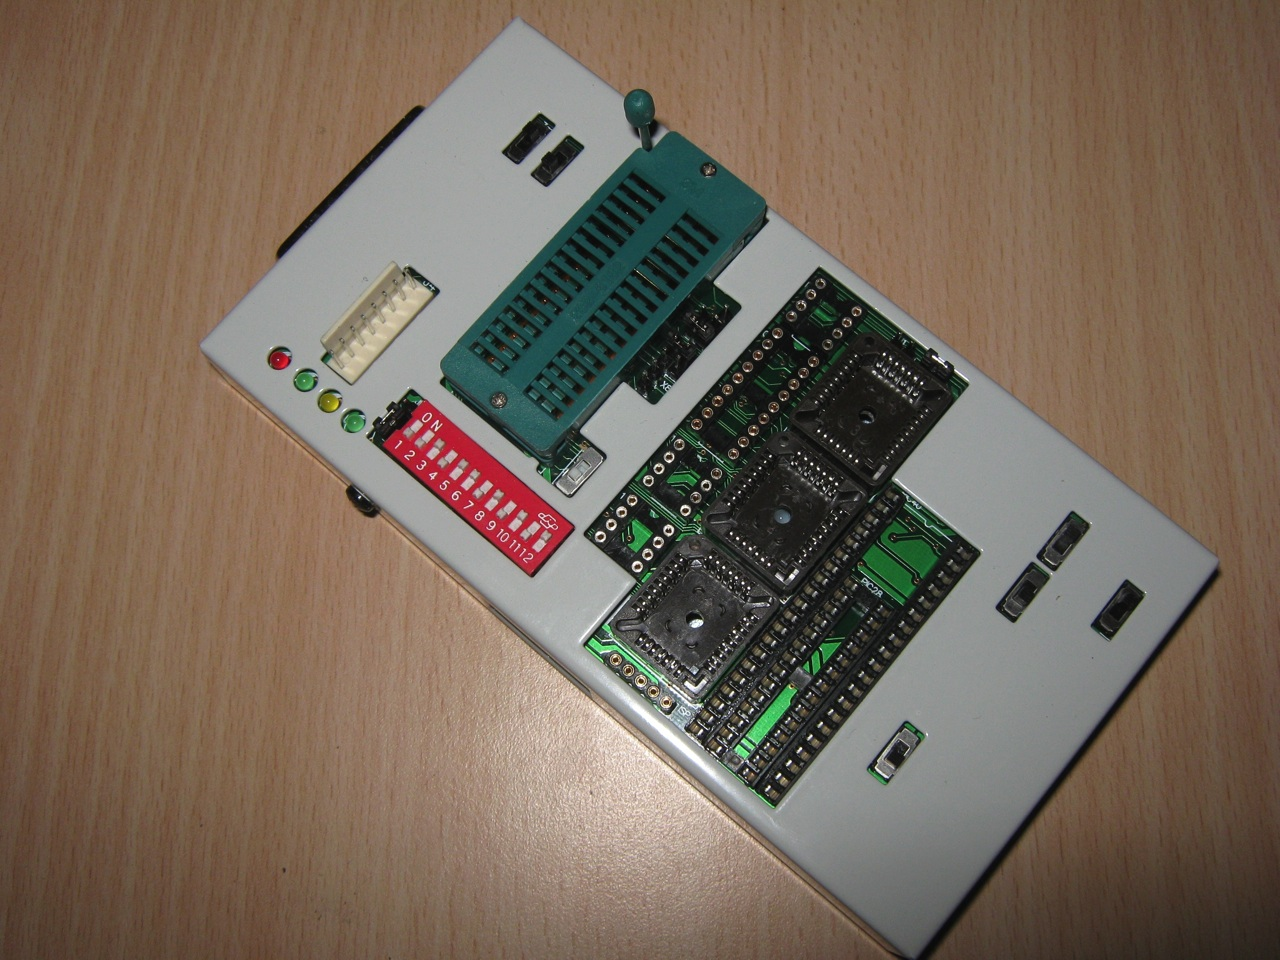 Unboxing Willem Pro 4 Isp Programmer Nightfall Blog Atmel Chip8051 Programmeratmel Circuitatmel